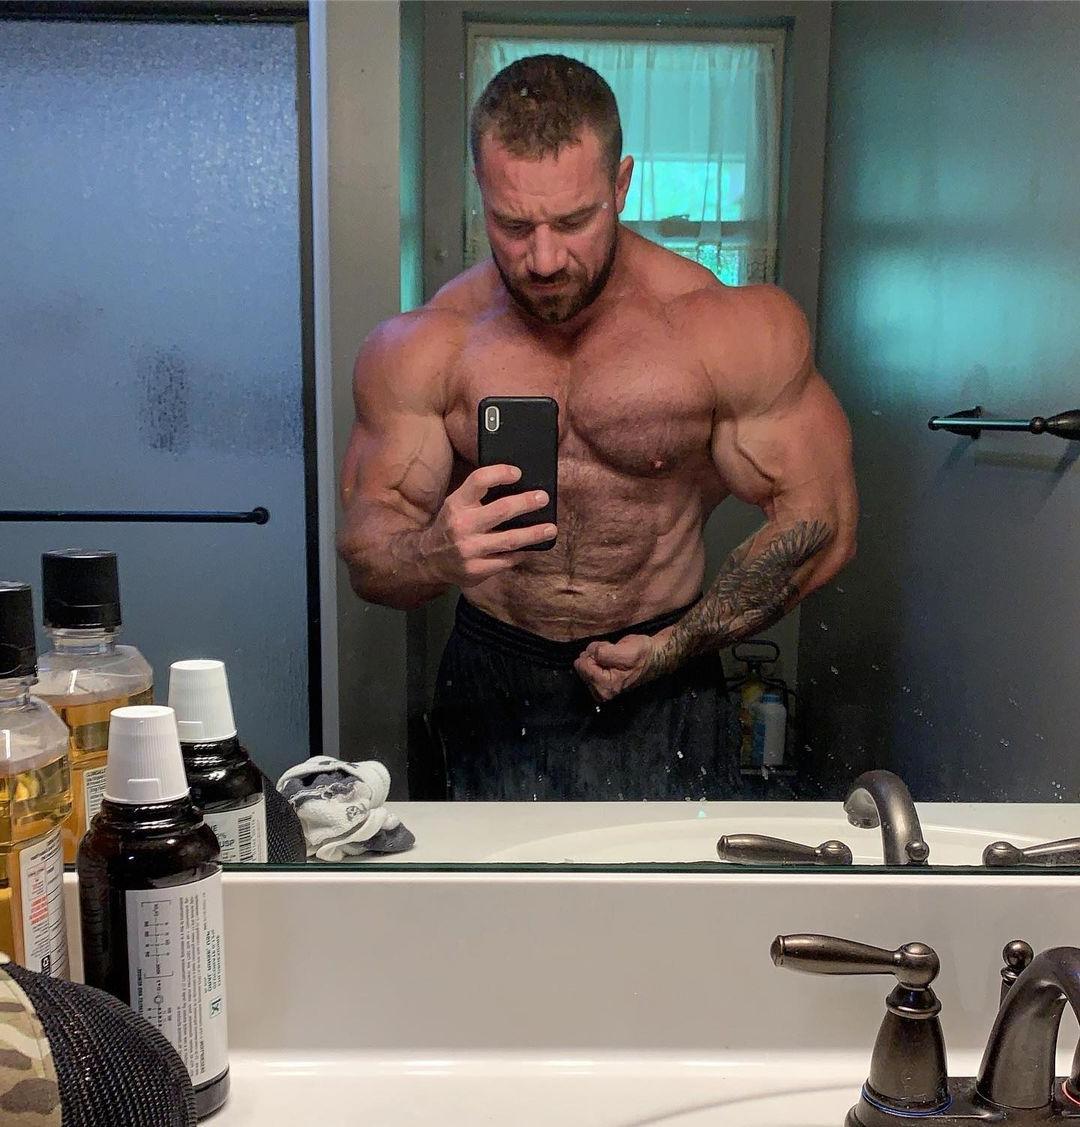 sexy-shirtless-alpha-daddy-seth-feroce-swole-muscular-body-huge-biceps-selfie